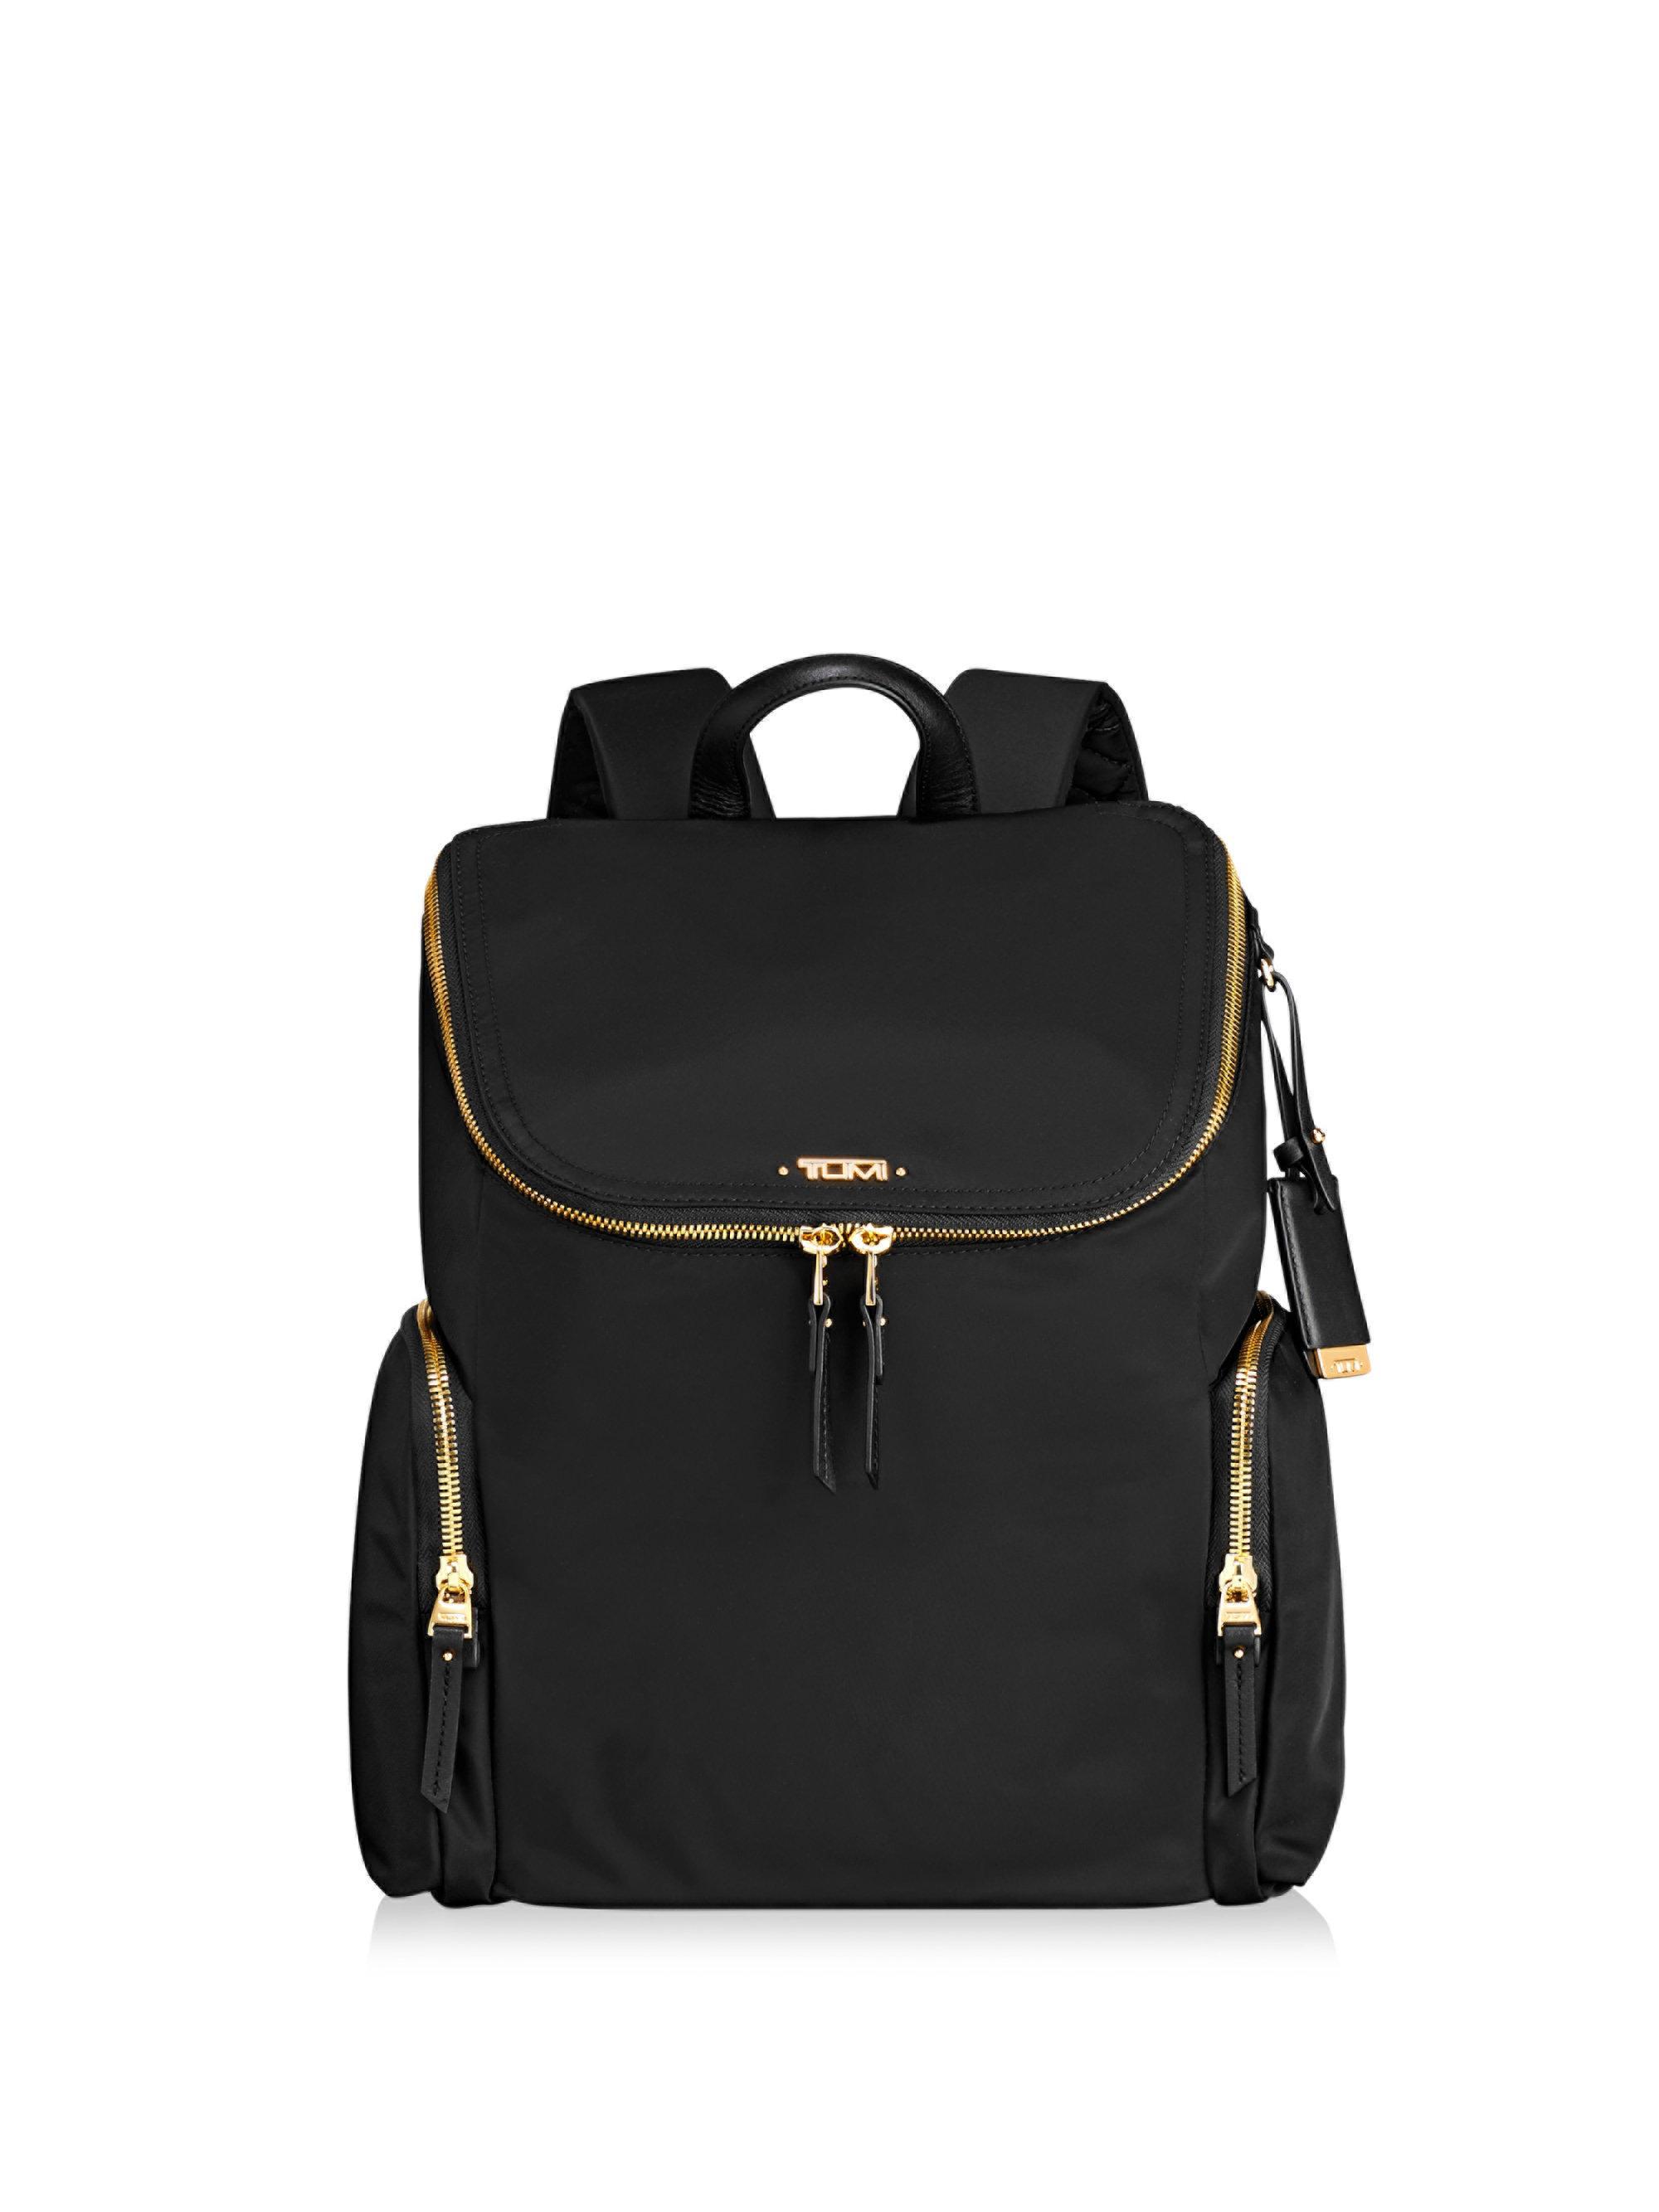 ... Tumi Black Zip Flap Back Pack for Men Lyst. View Fullscreen san  francisco e6bfc 48e27  Adidas ... 497adb2693